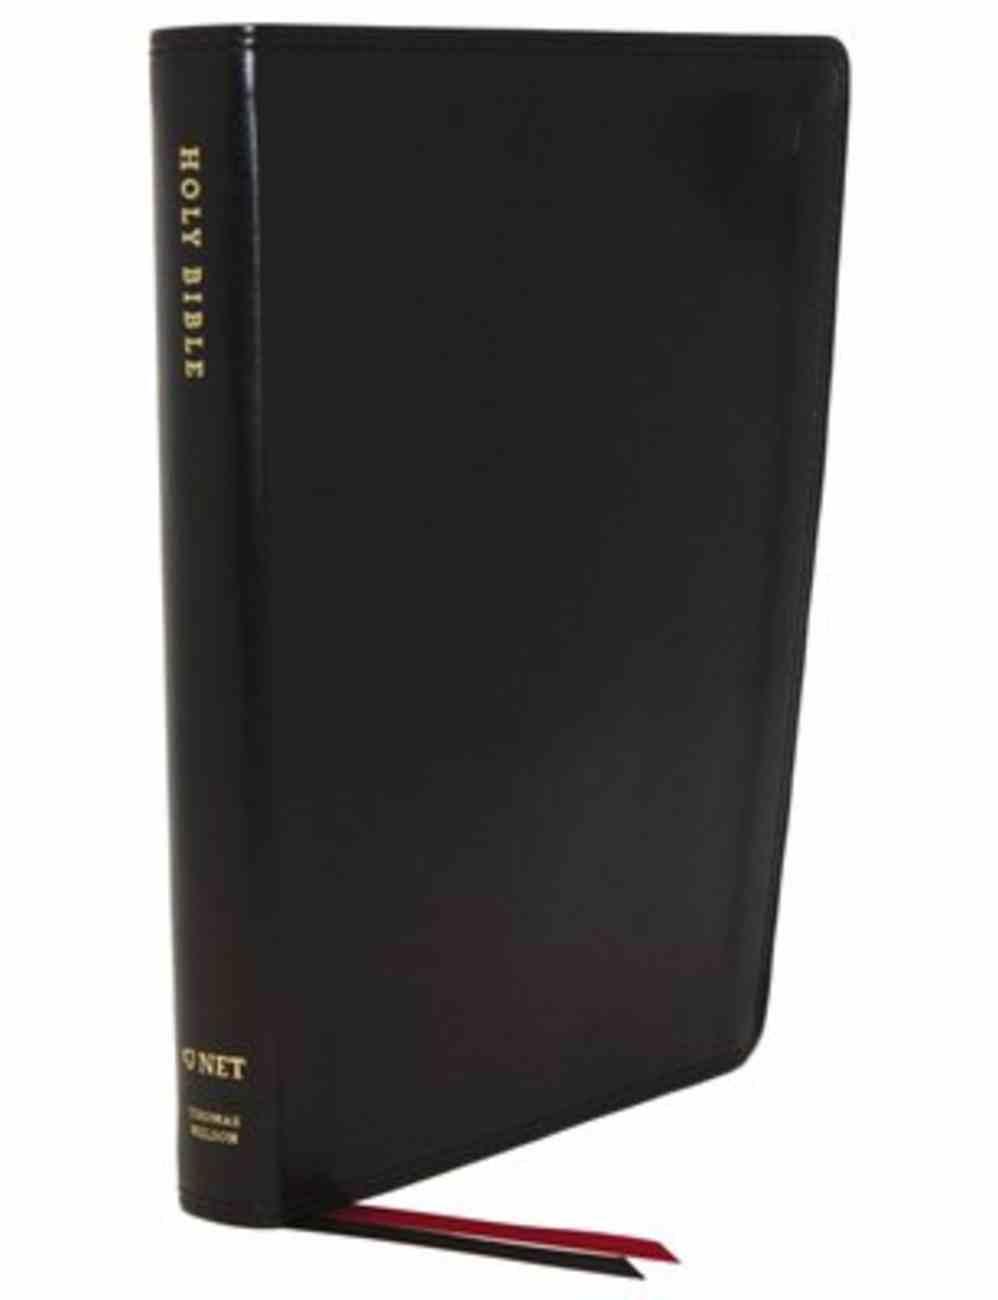 NET Bible Thinline Black Premium Imitation Leather